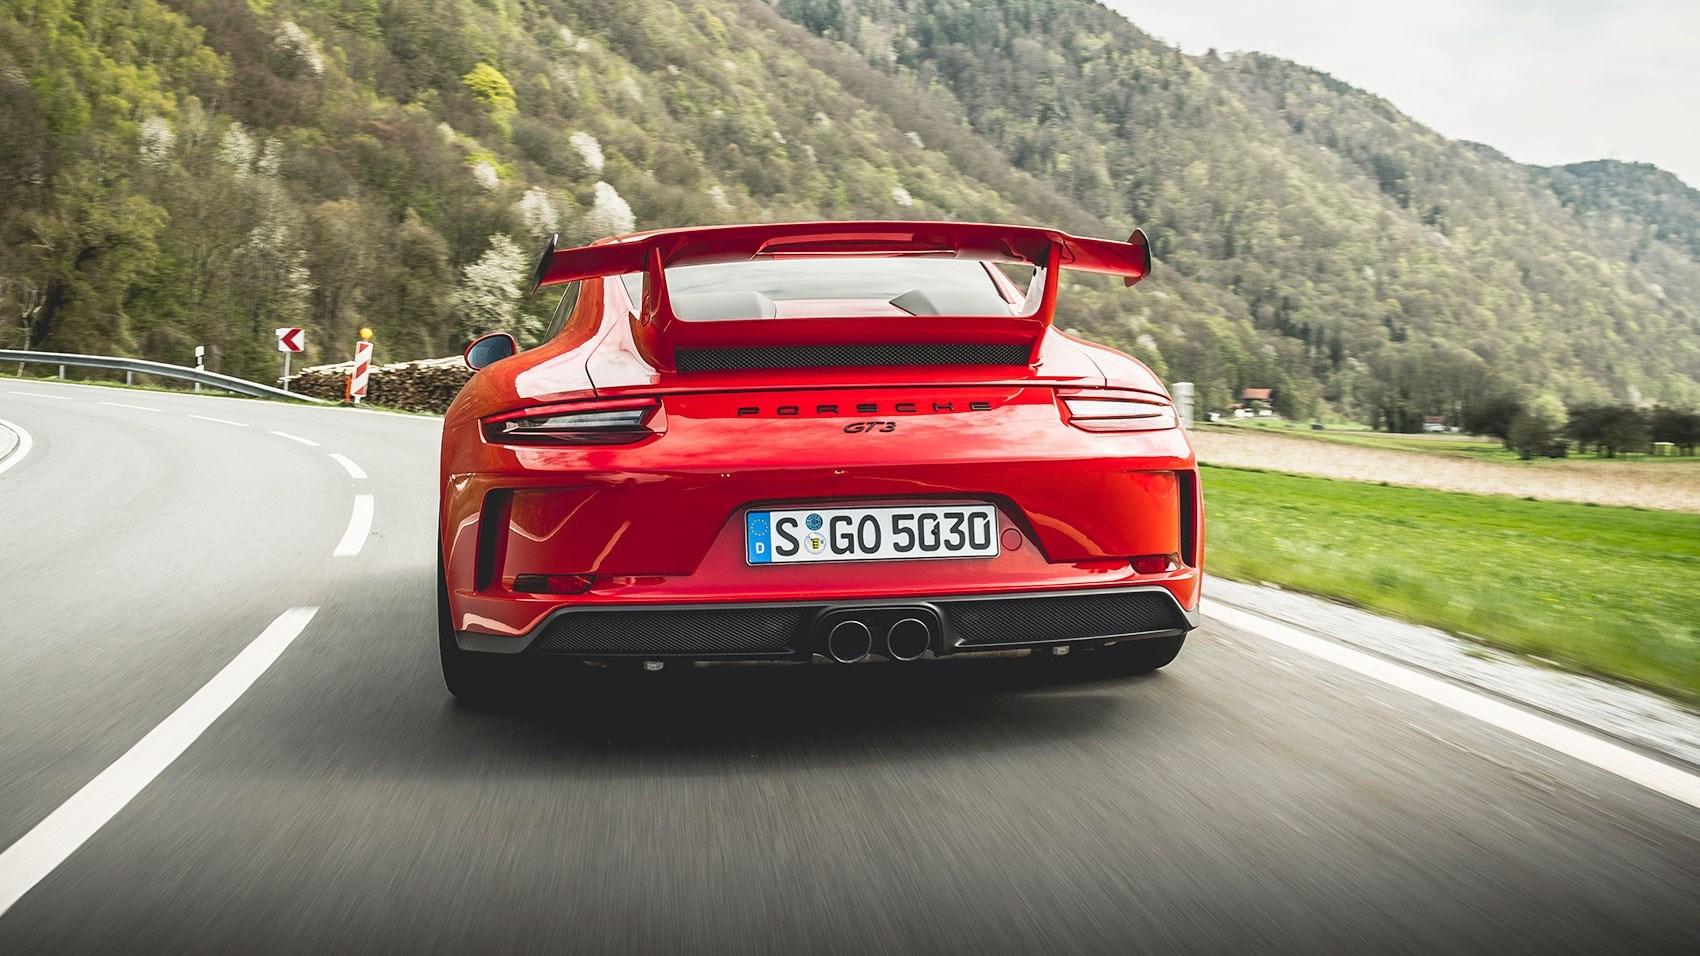 Mercedes Amg Gt R Vs Porsche 911 Gt3 Twin Test Review 2017 Car